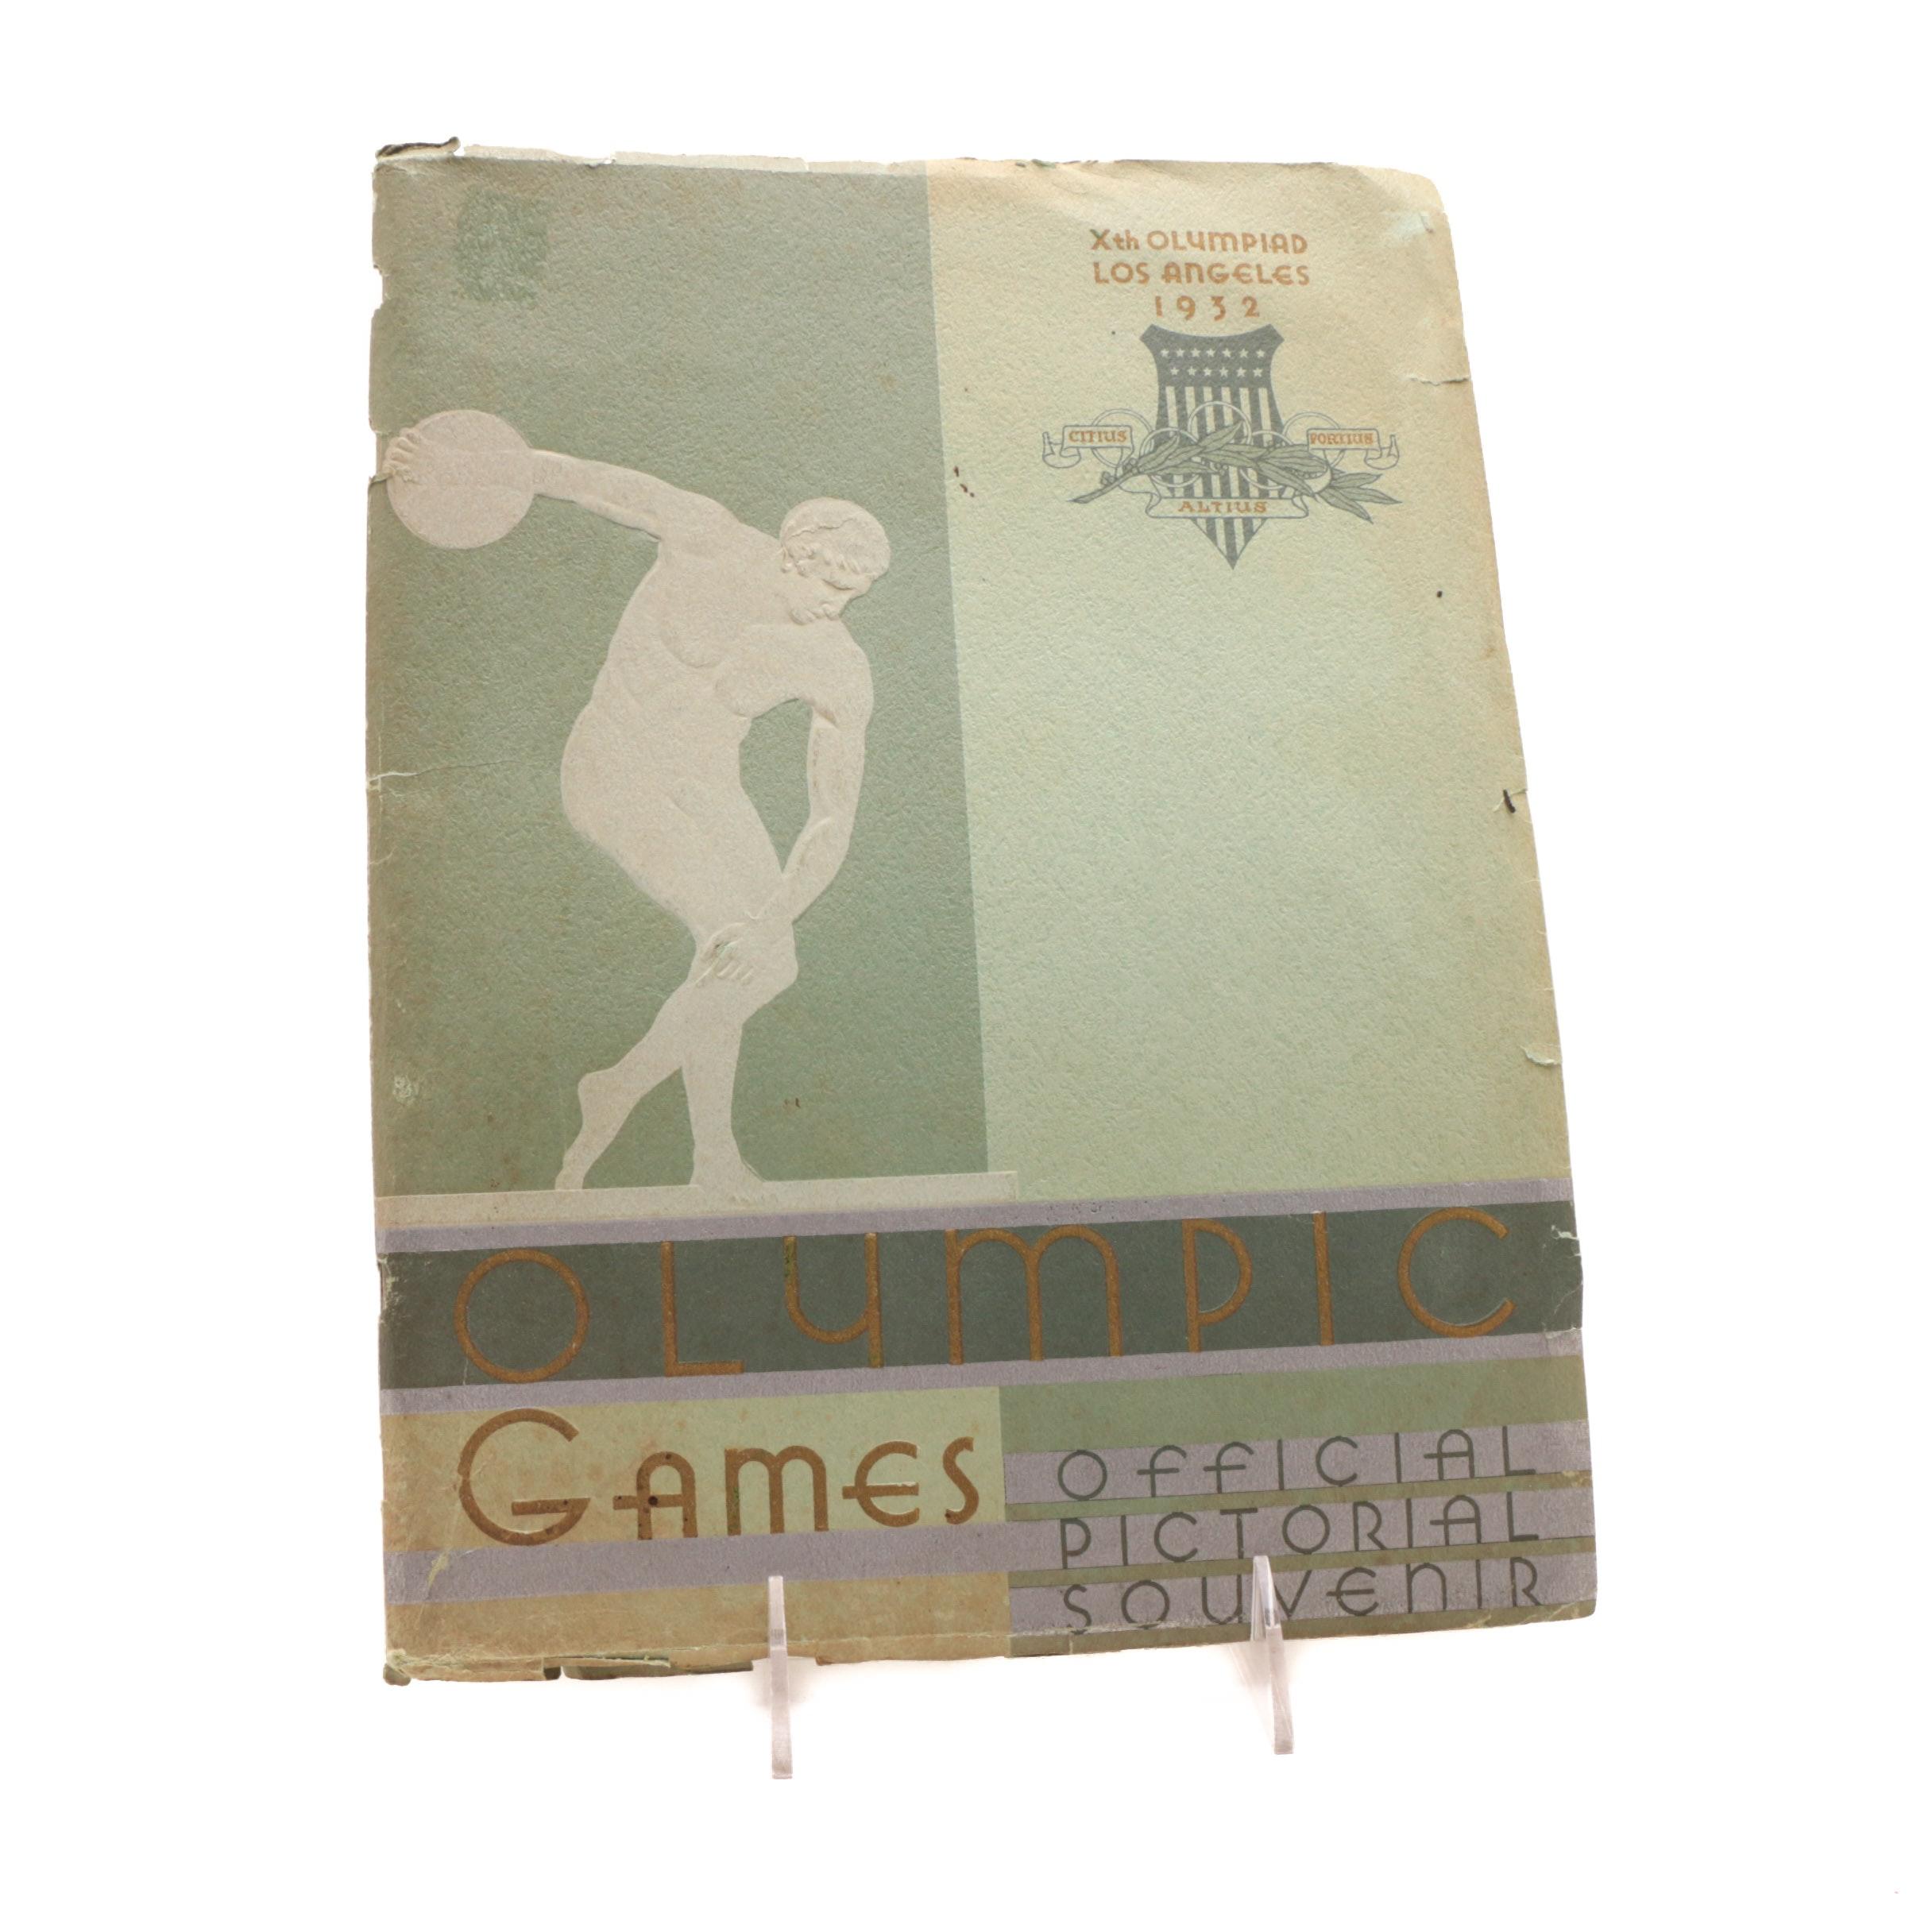 1932 Los Angeles Olympics Souvenir Book